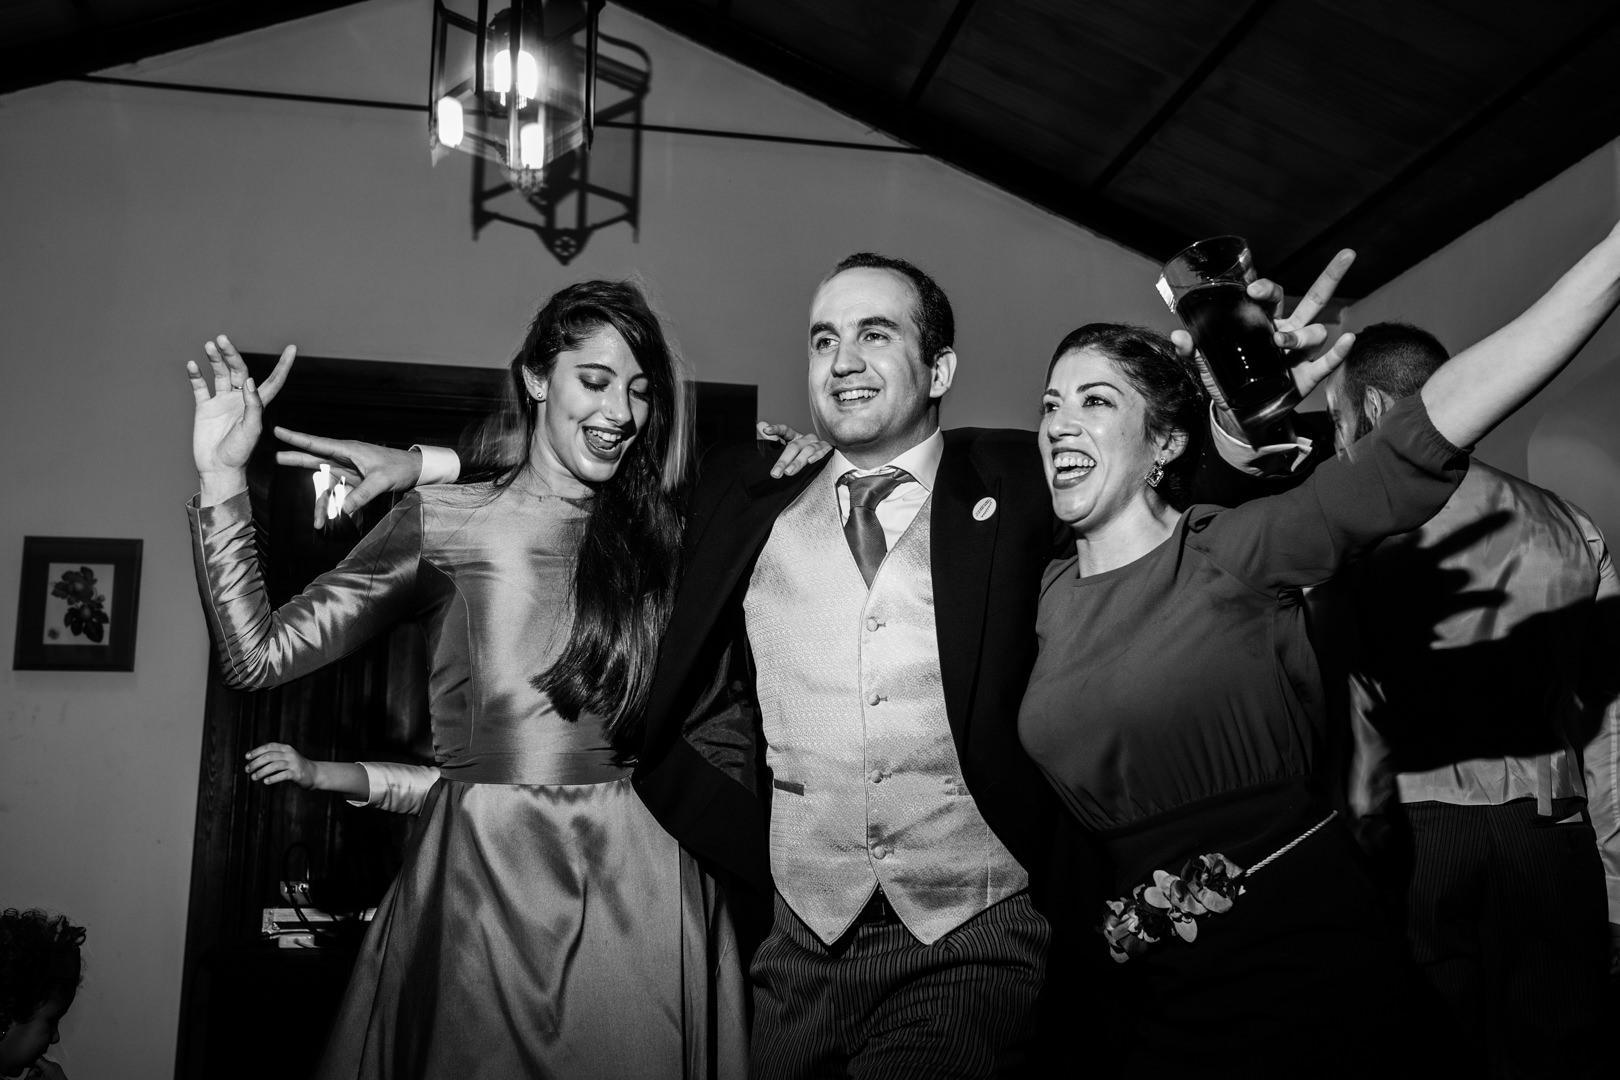 Boda-sevilla-Wedding-engagement-Rafael-Torres-fotografo-bodas-sevilla-madrid-barcelona-wedding-photographer--85.jpg